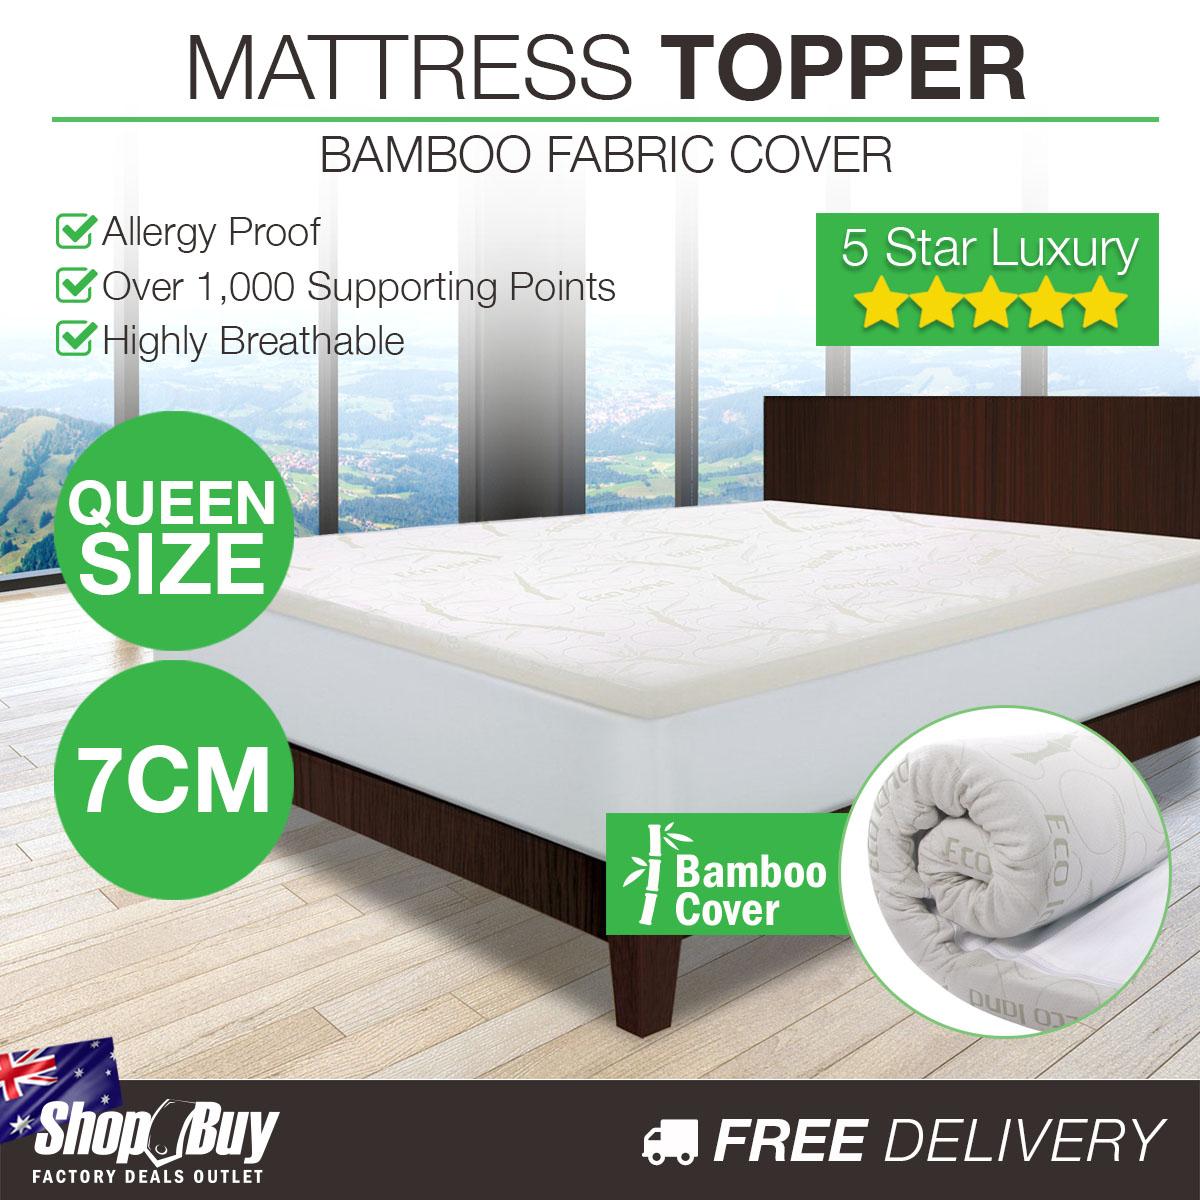 7cm Memory Foam Mattress Topper Eco Friendly Bamboo Fabric